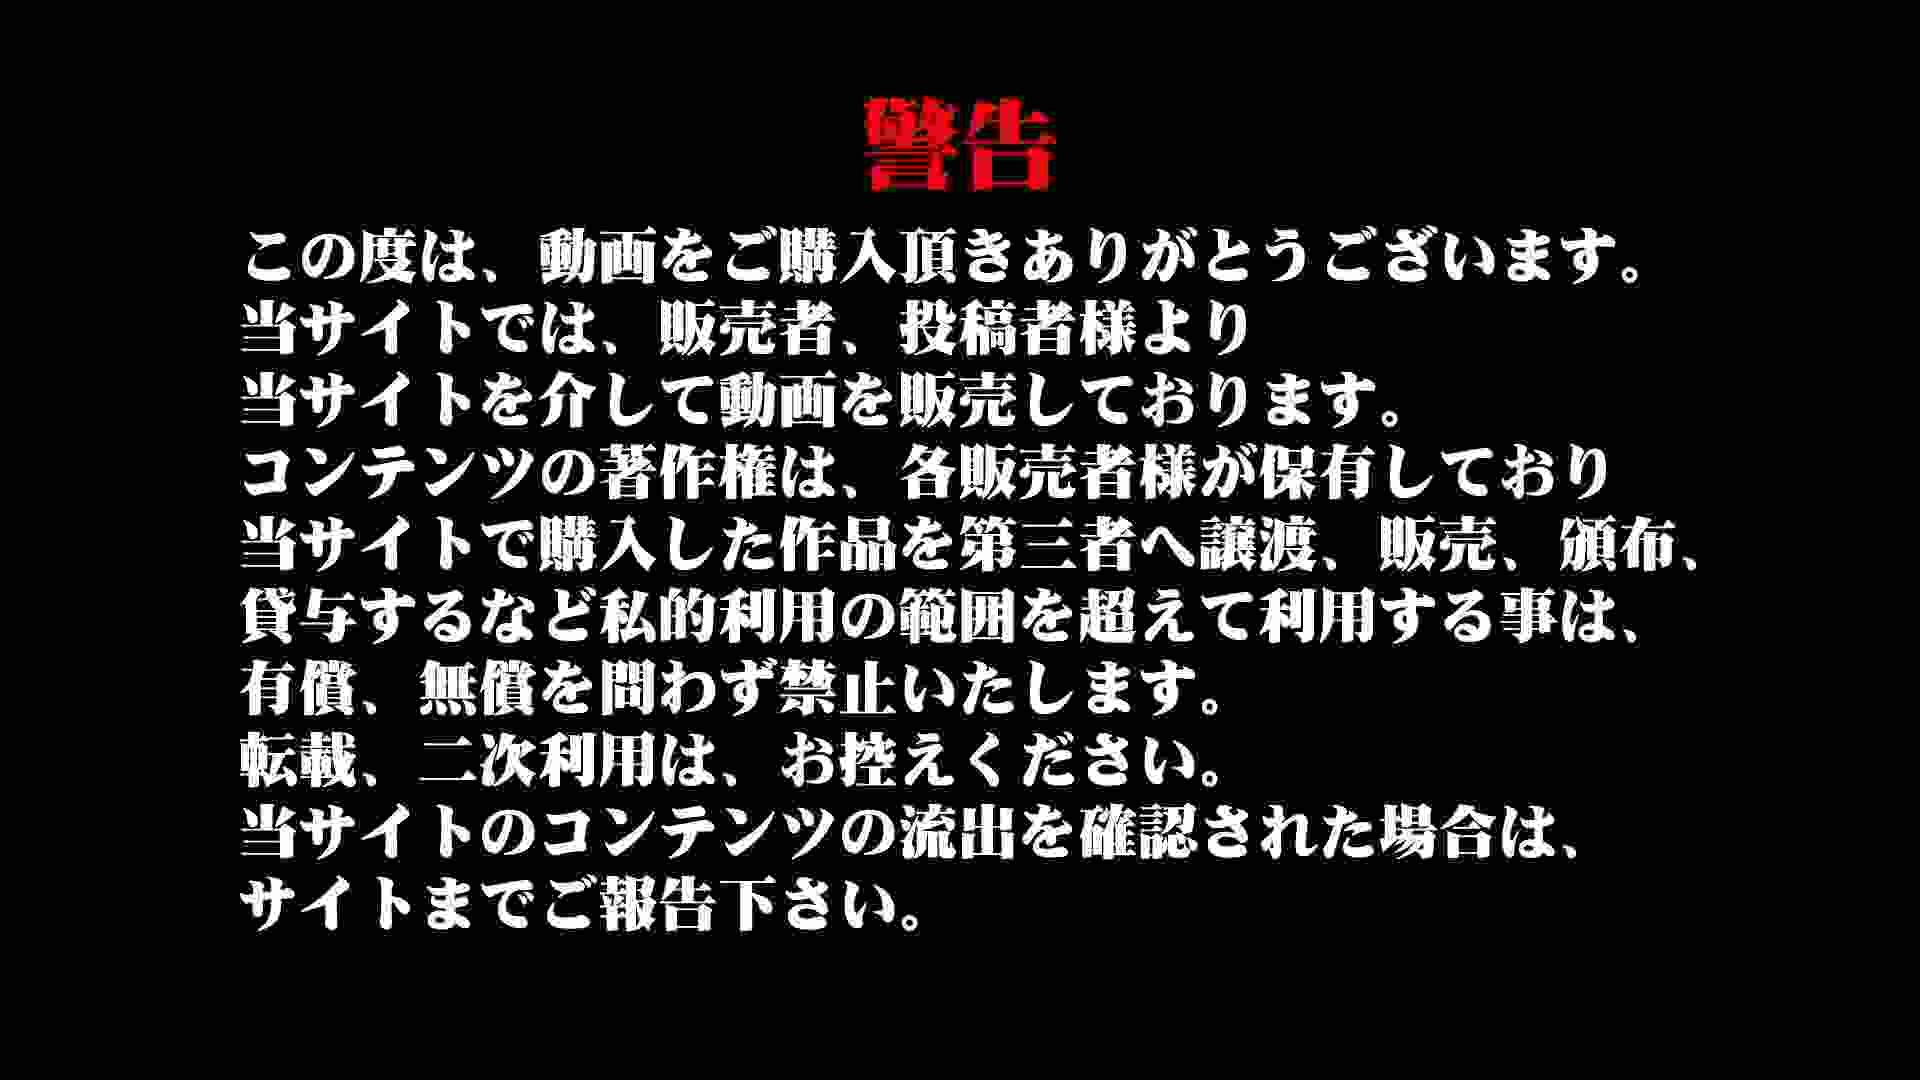 Aquaな露天風呂Vol.874潜入盗撮露天風呂十判湯 其の一 OL女体  81連発 4